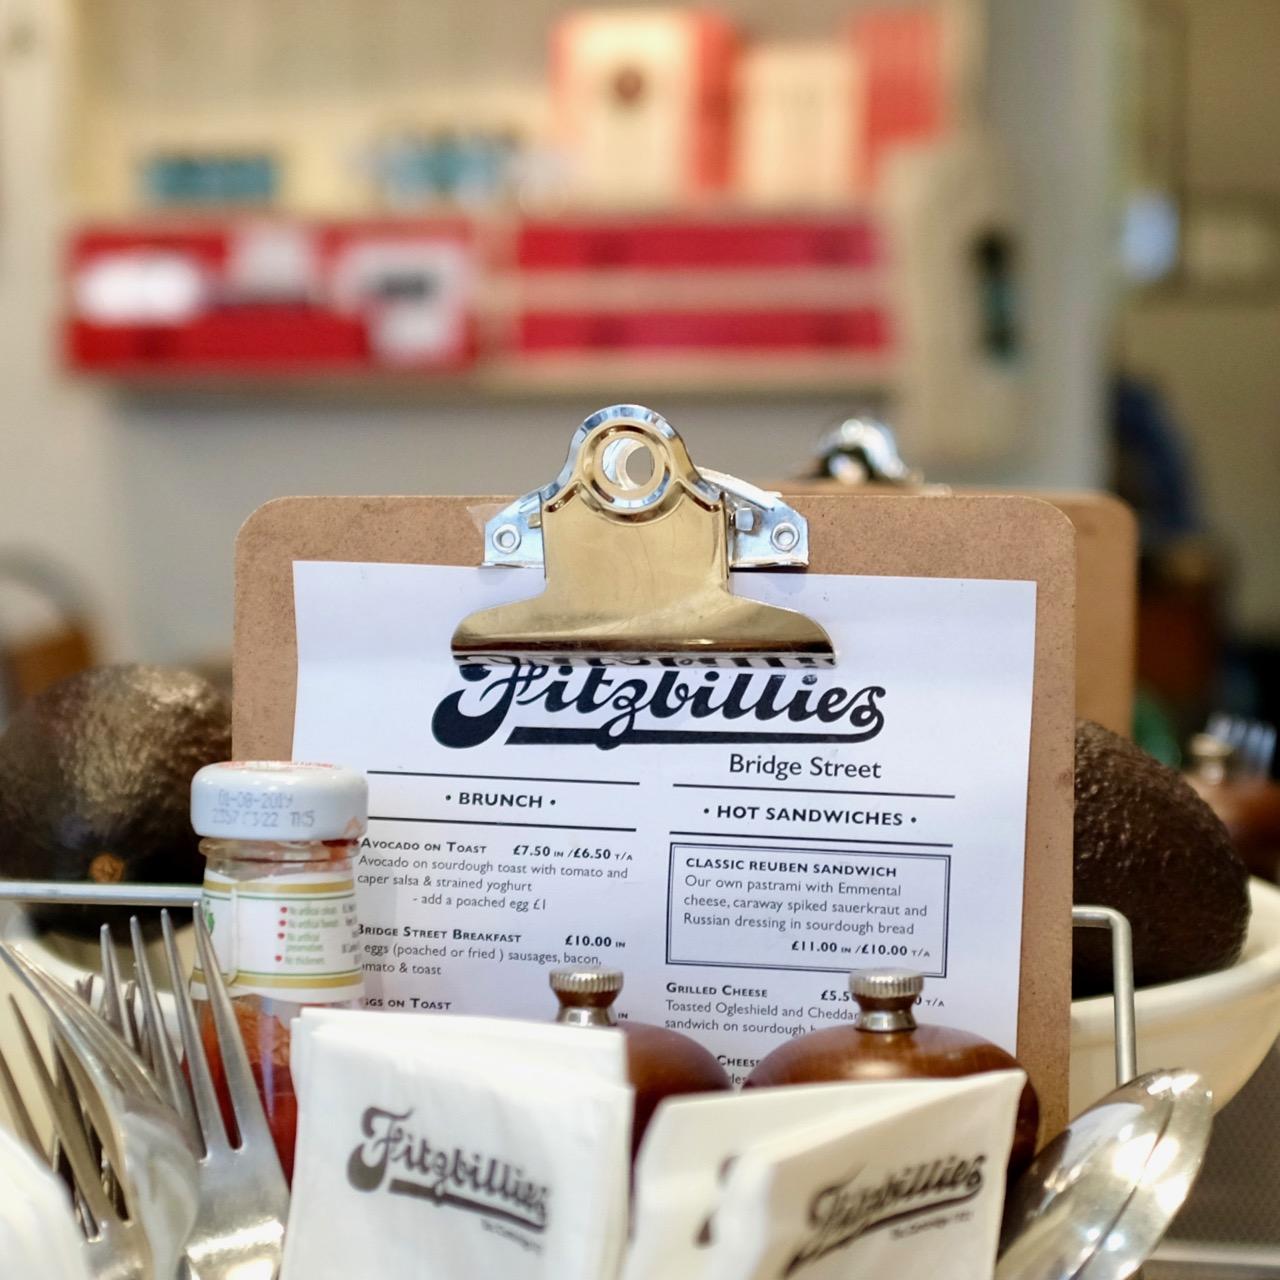 Fitzbillies on Bridge Street